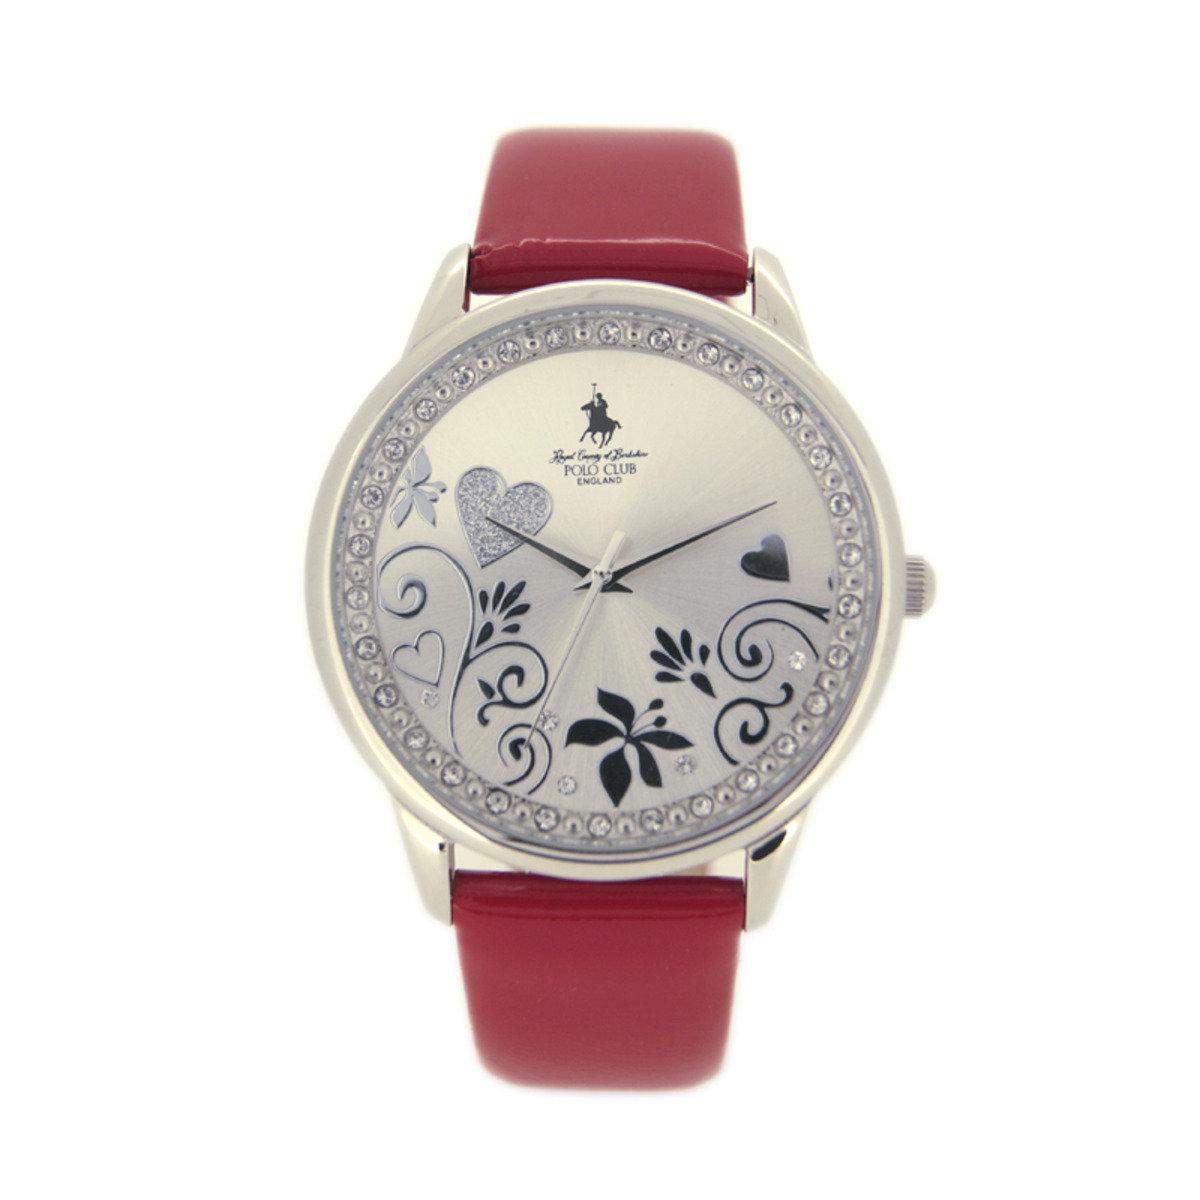 PL165-858RD-P Watch